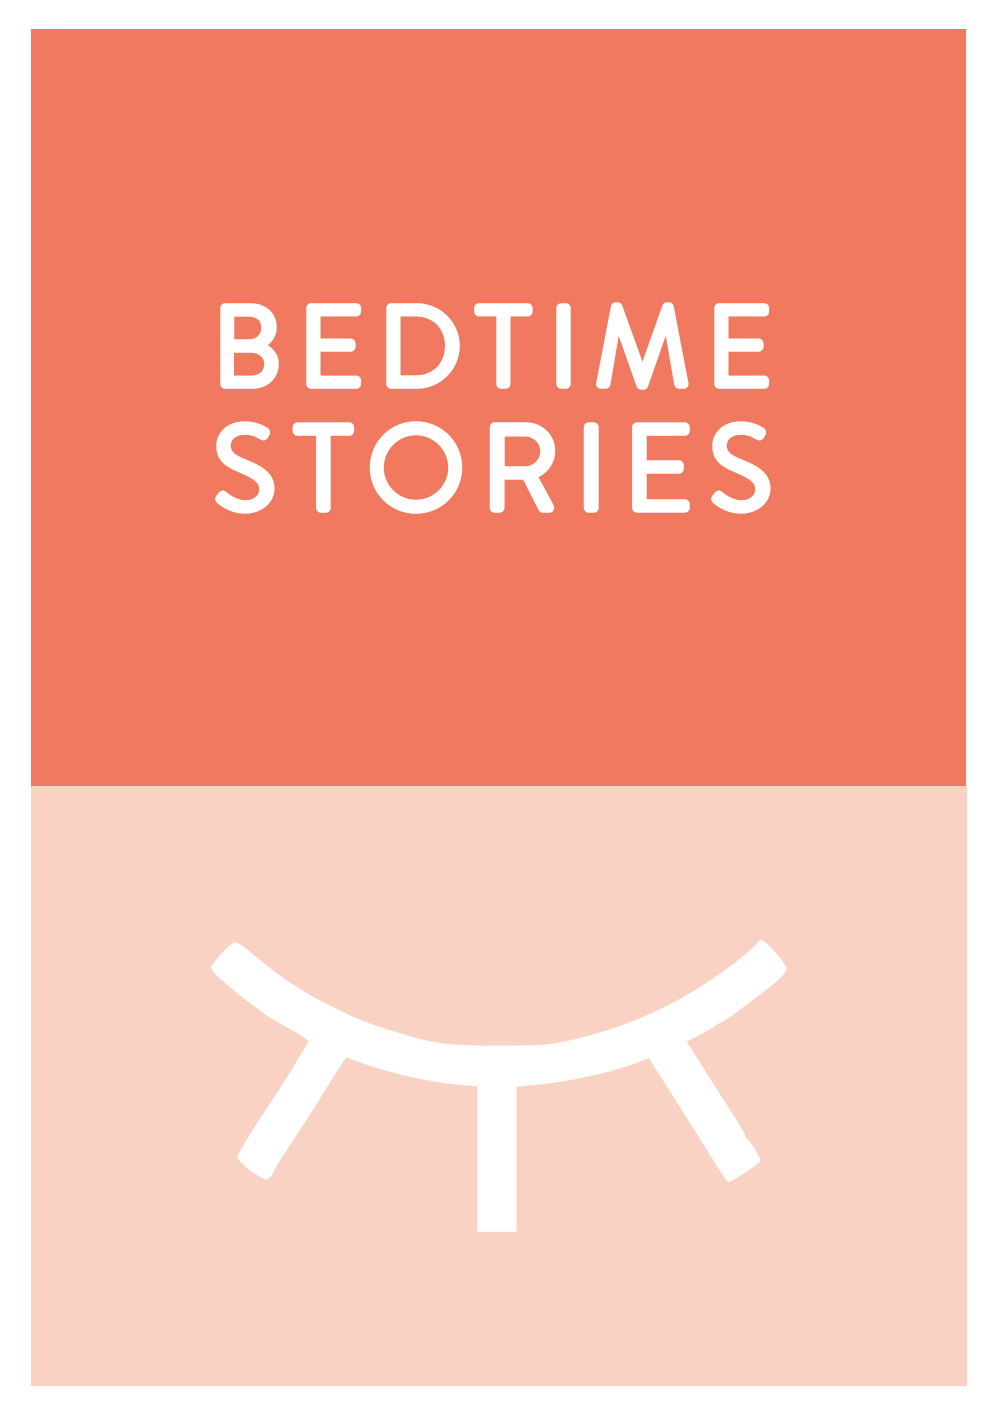 ☾ Bedtime Stories ☽ 16.12.2017 –  28.02.2018